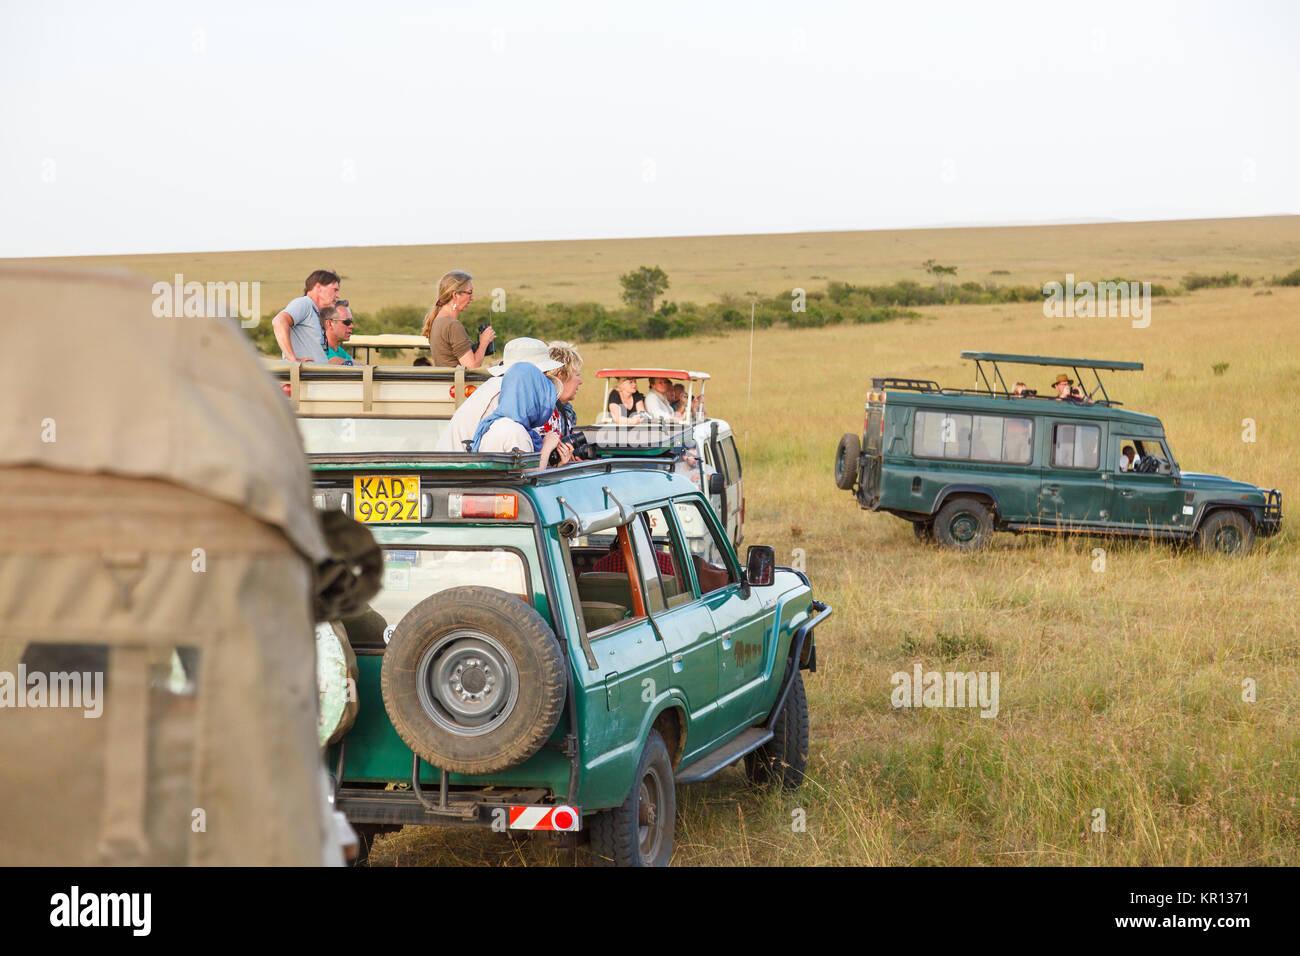 Tourists in safari vehicles on the savannah of the Masai Mara, Kenya - Stock Image